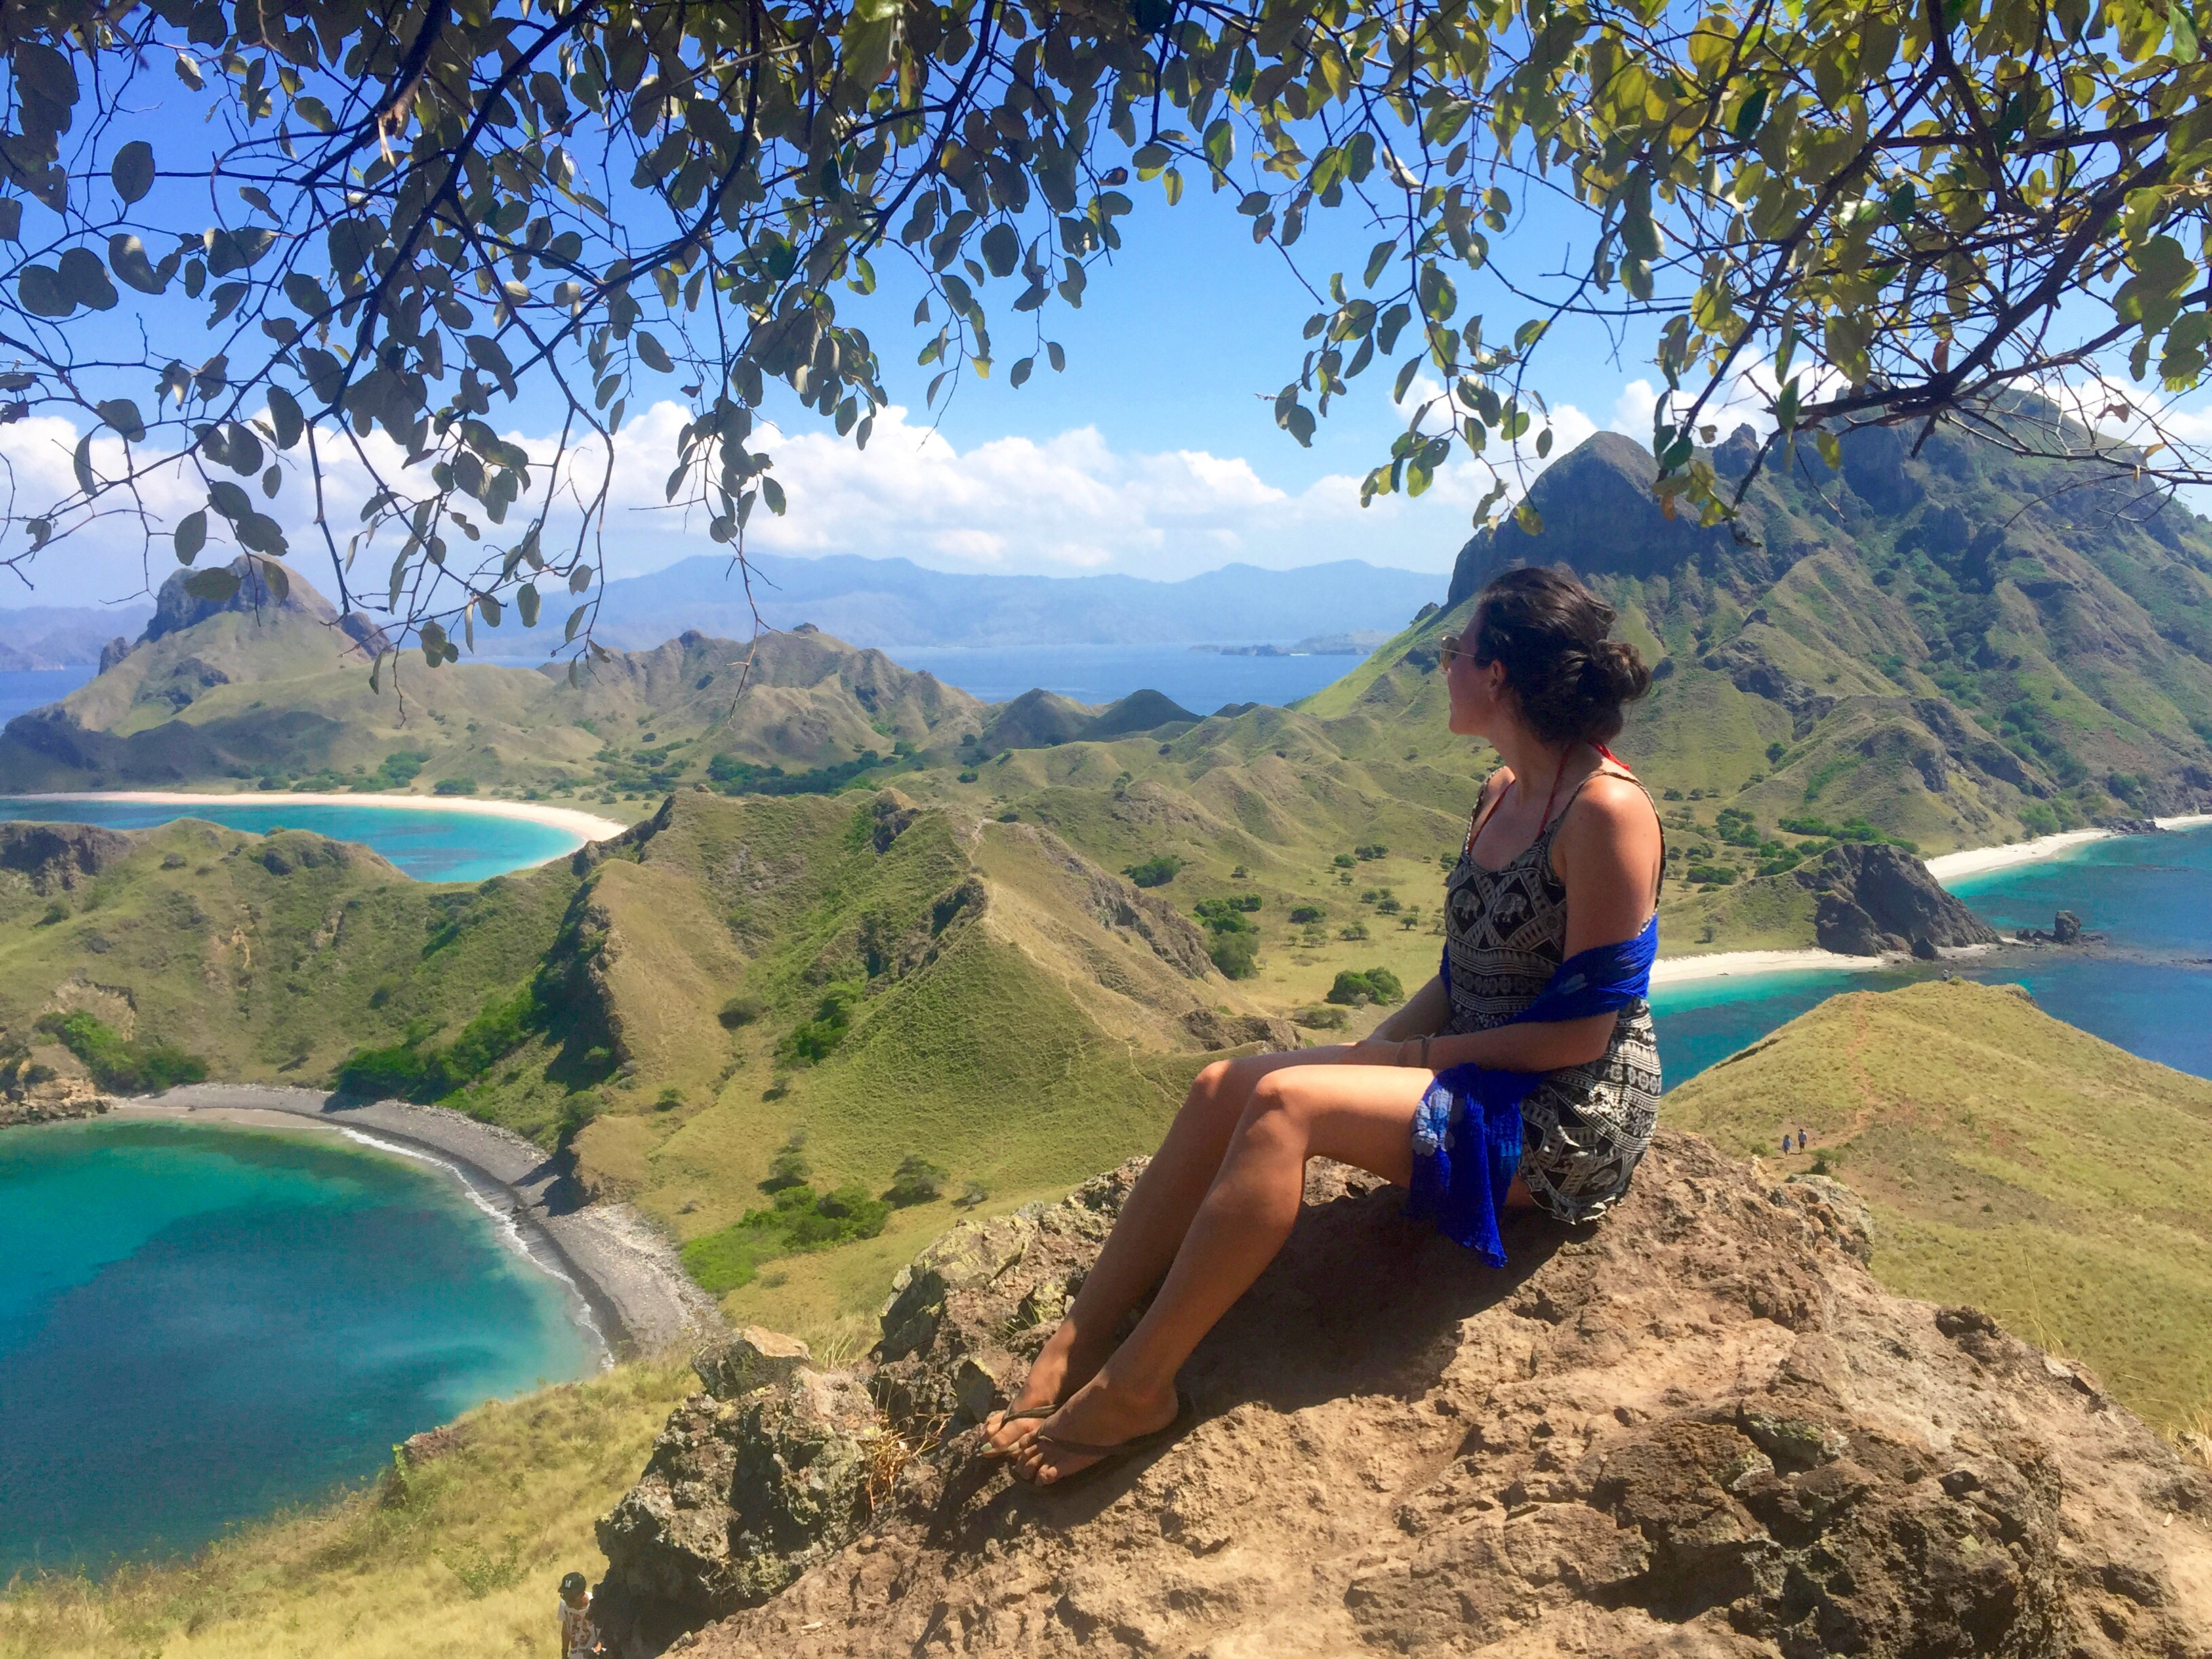 padar-island-indonesia